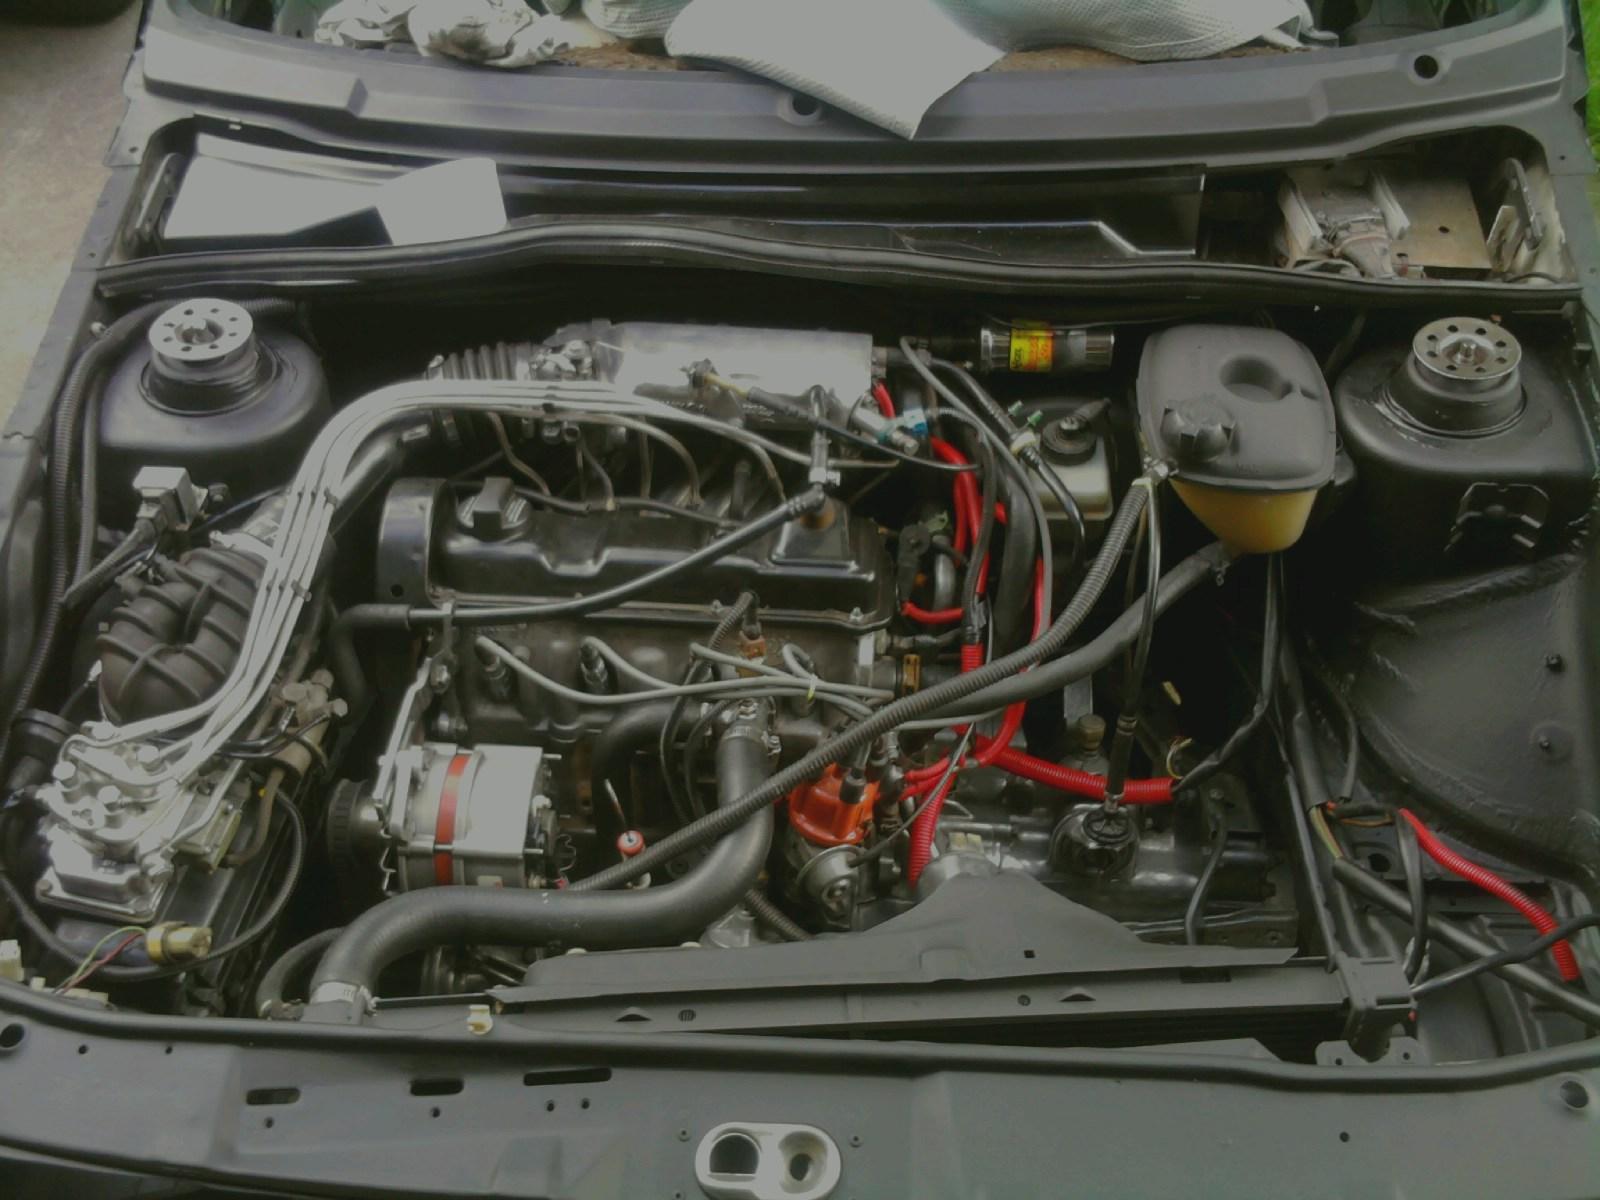 1985_volkswagen_jetta pic 7499948064974901191 1985 volkswagen jetta cl td related infomation,specifications